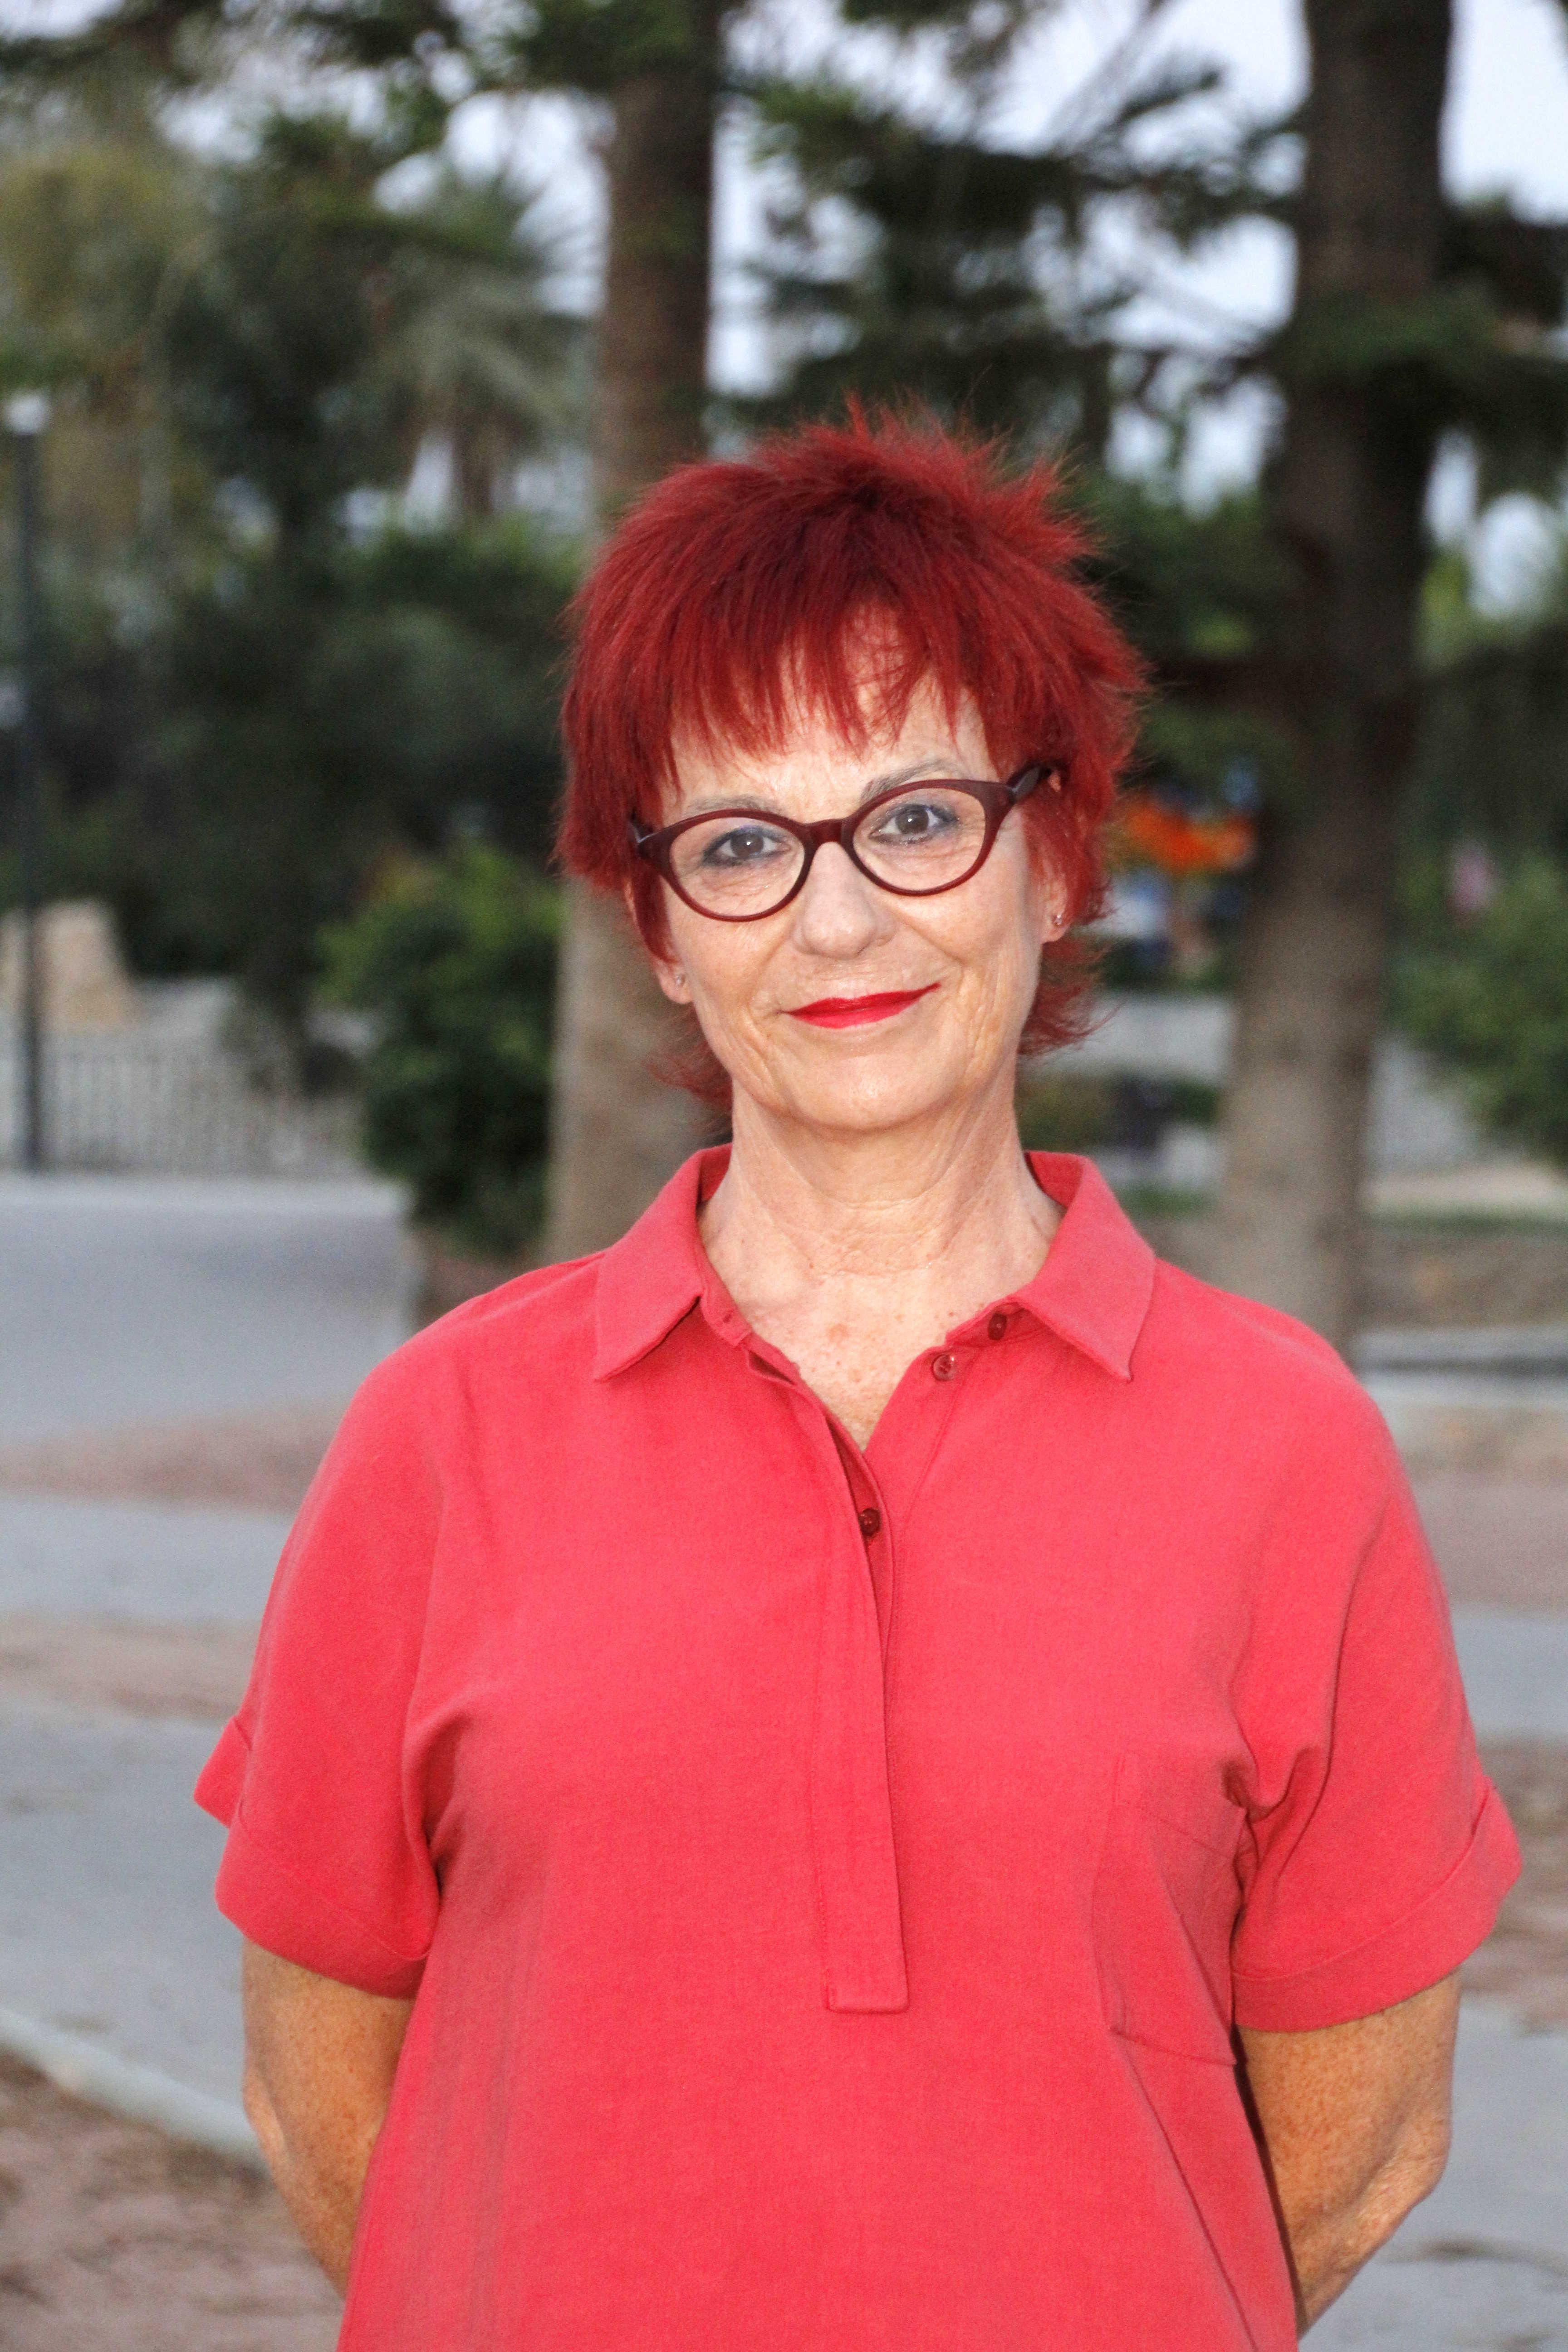 Alicia Poza Sebastián